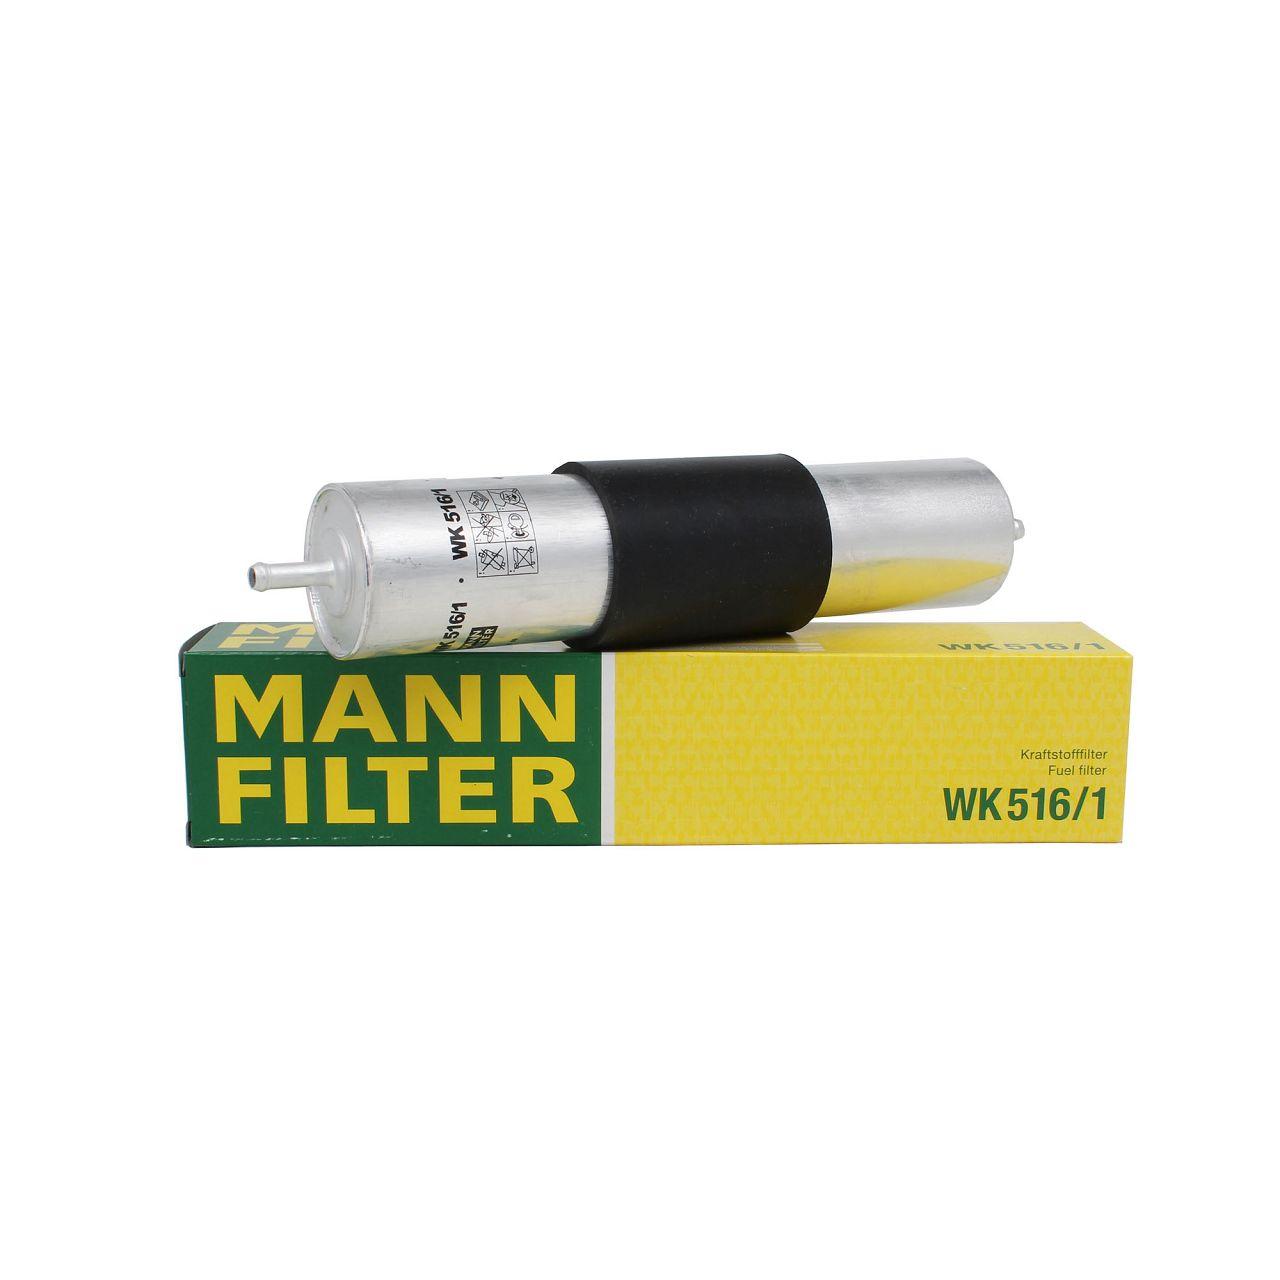 MANN Kraftstofffilter Benzinfilter WK516/1 BMW 3er E36 E46 5er E34 E39 7er E38